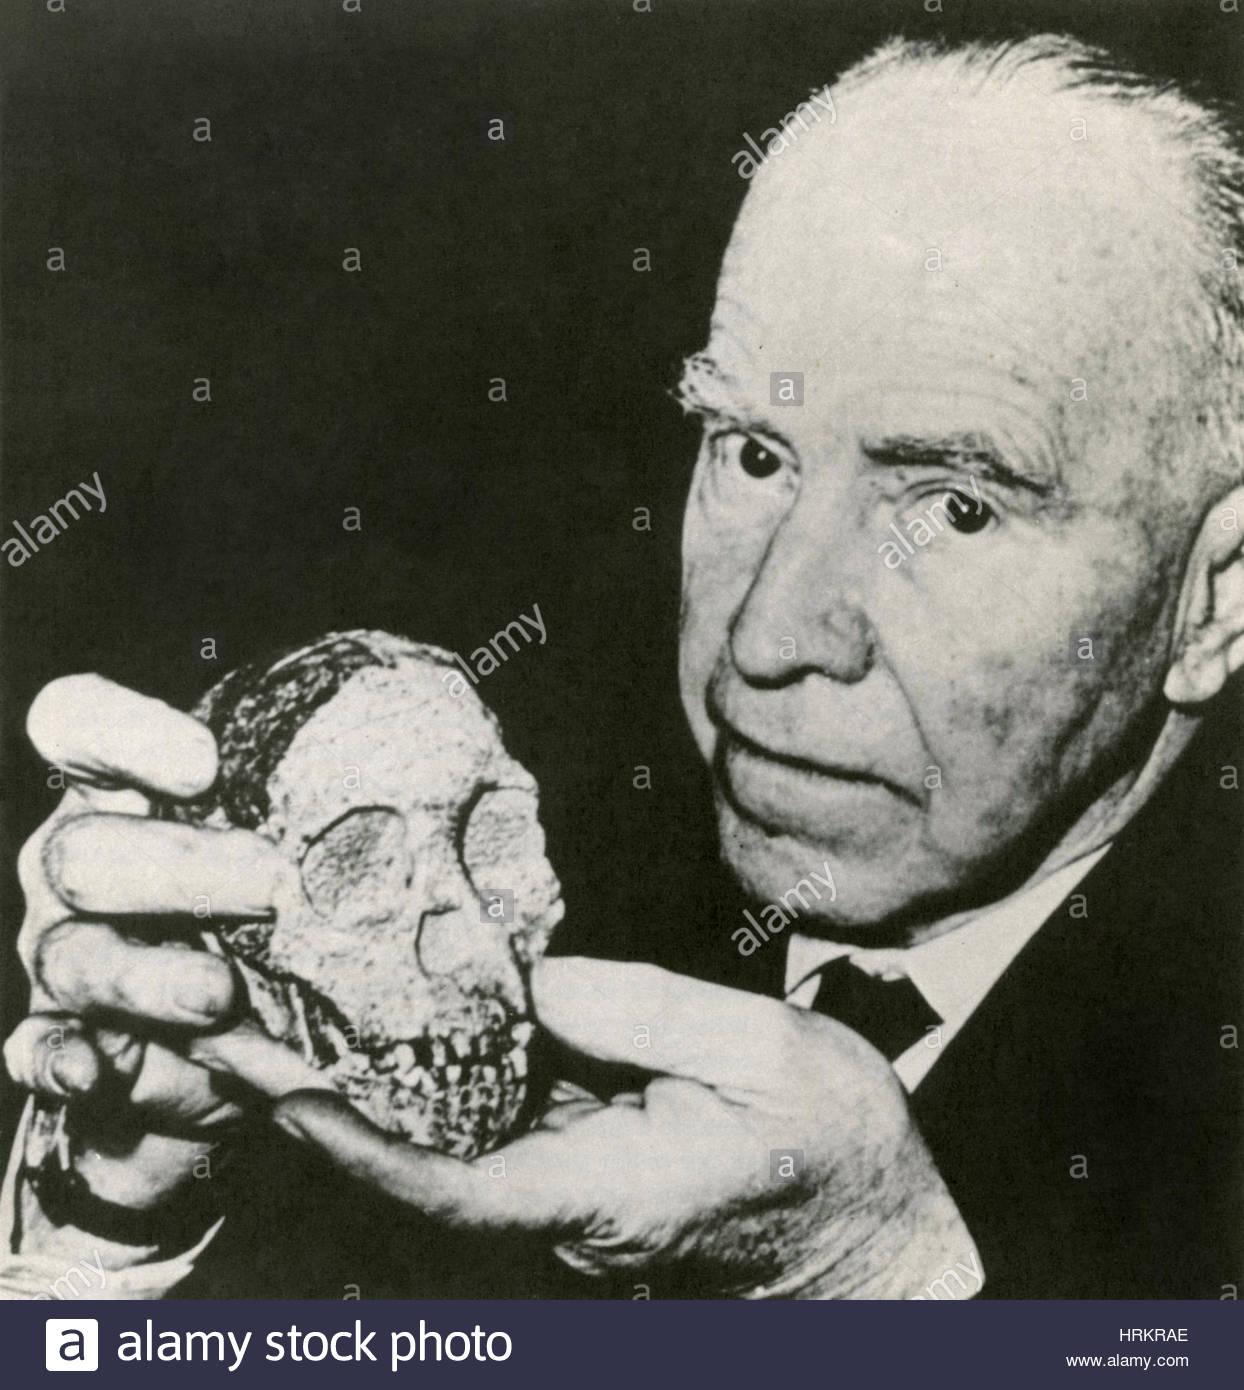 Raymond Dart with Taung Child Skull - Stock Image